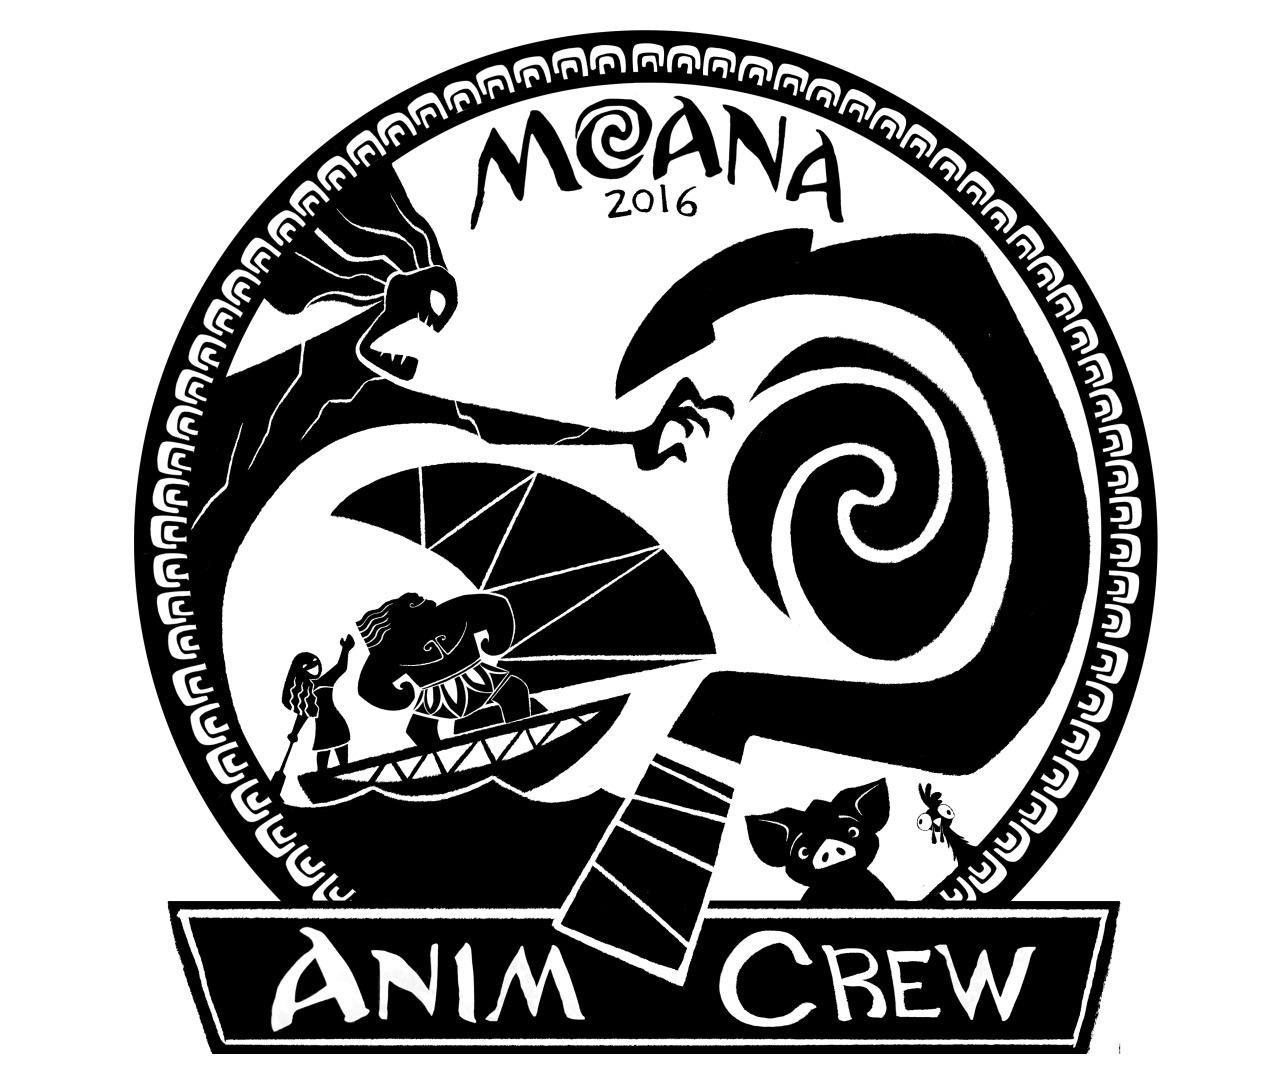 Moana Animation Crew Emblem by Trent Correy.jpg